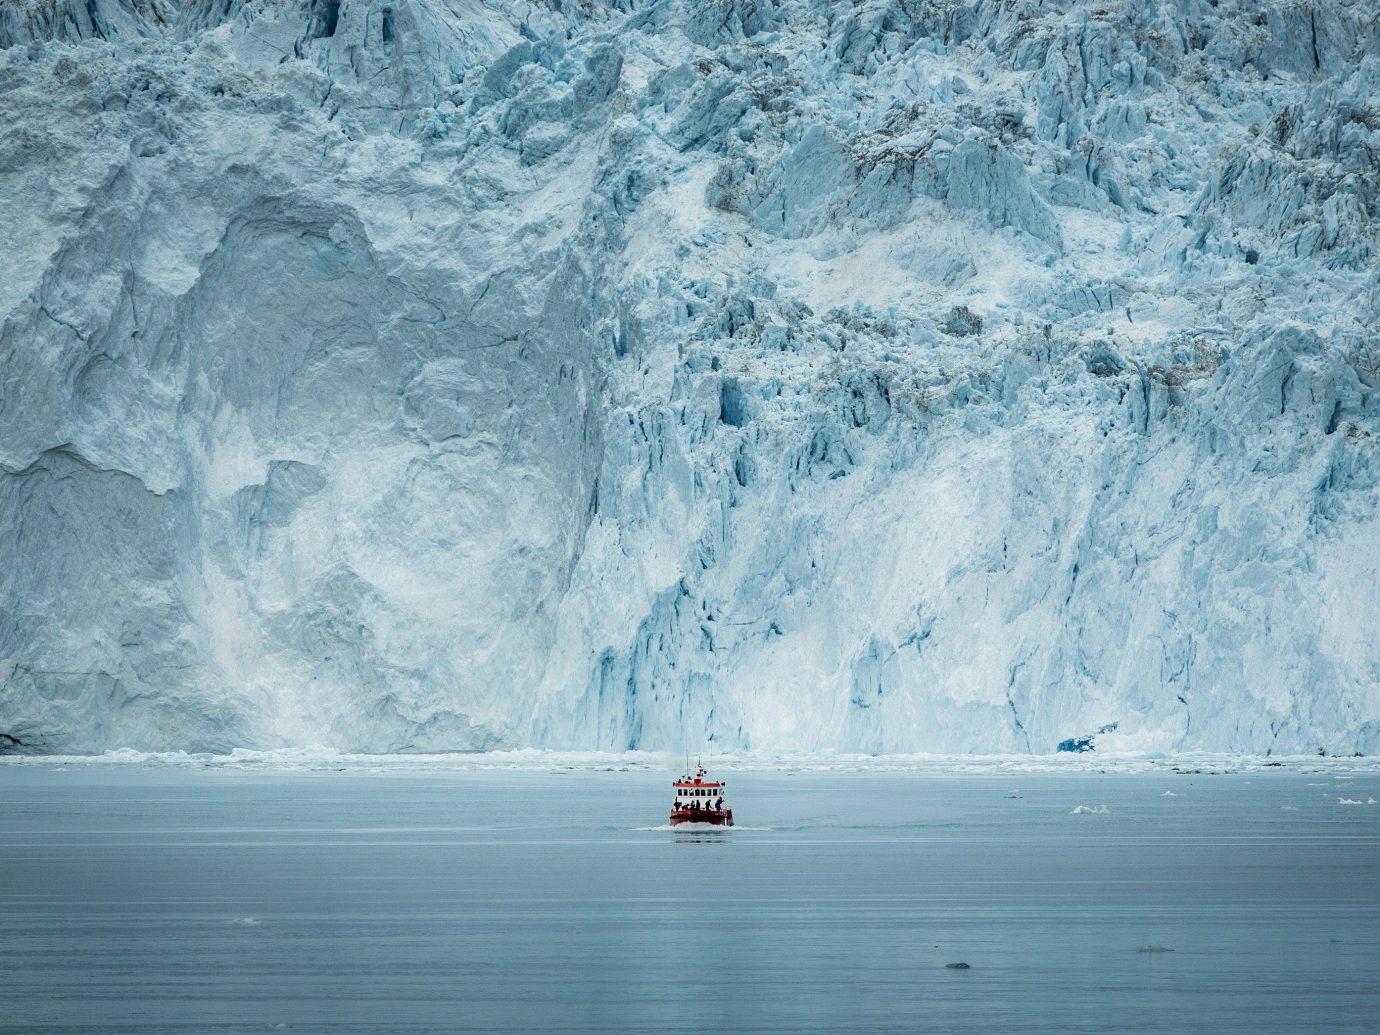 A small passenger boat crosses the Eqip glacier